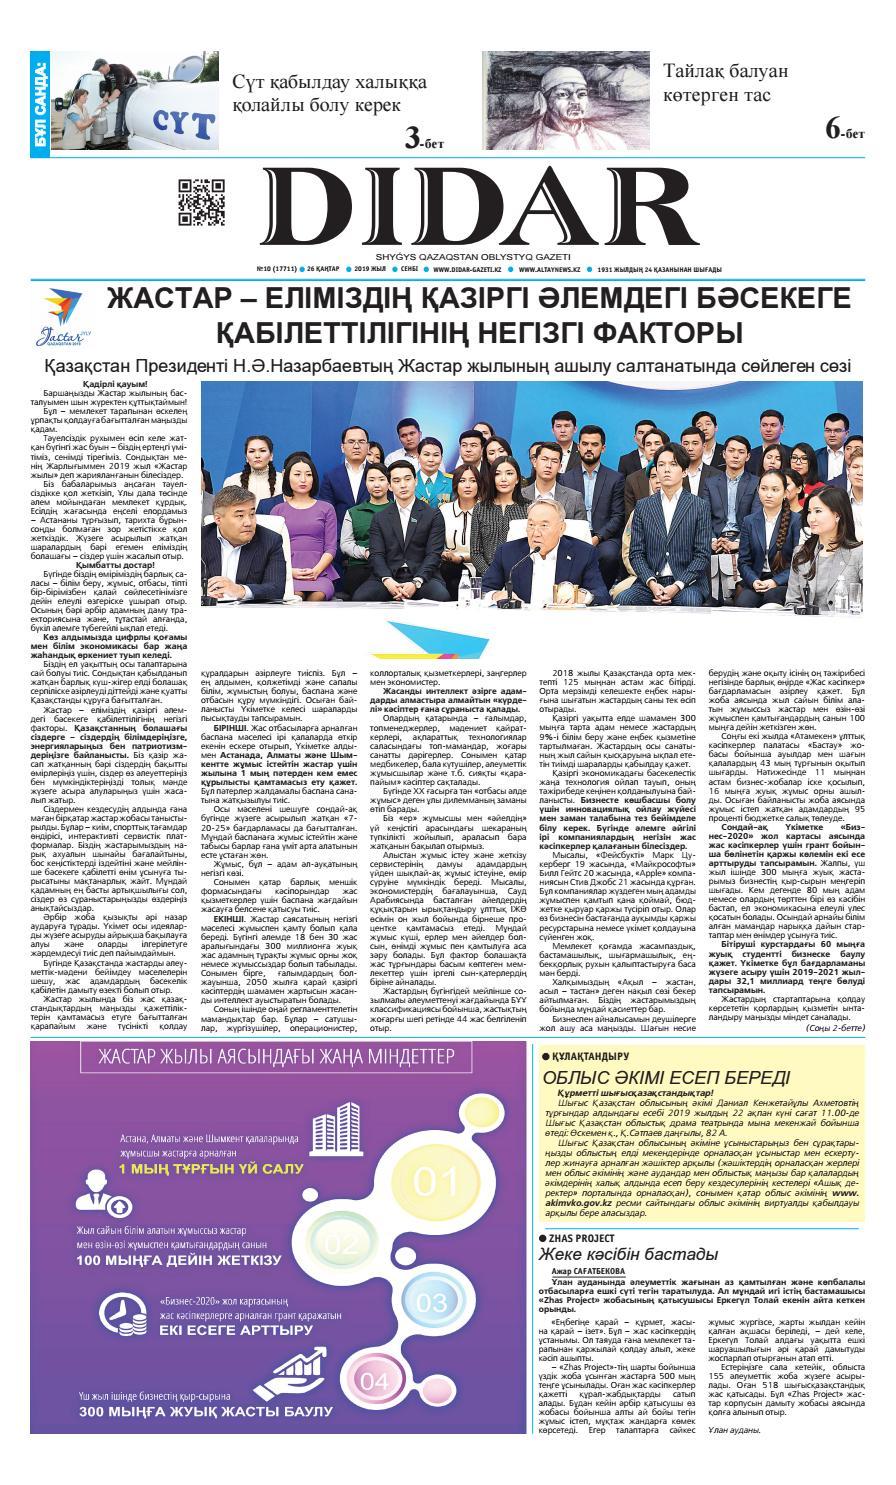 Ойын автоматы кран машинасы сатып алу Украина